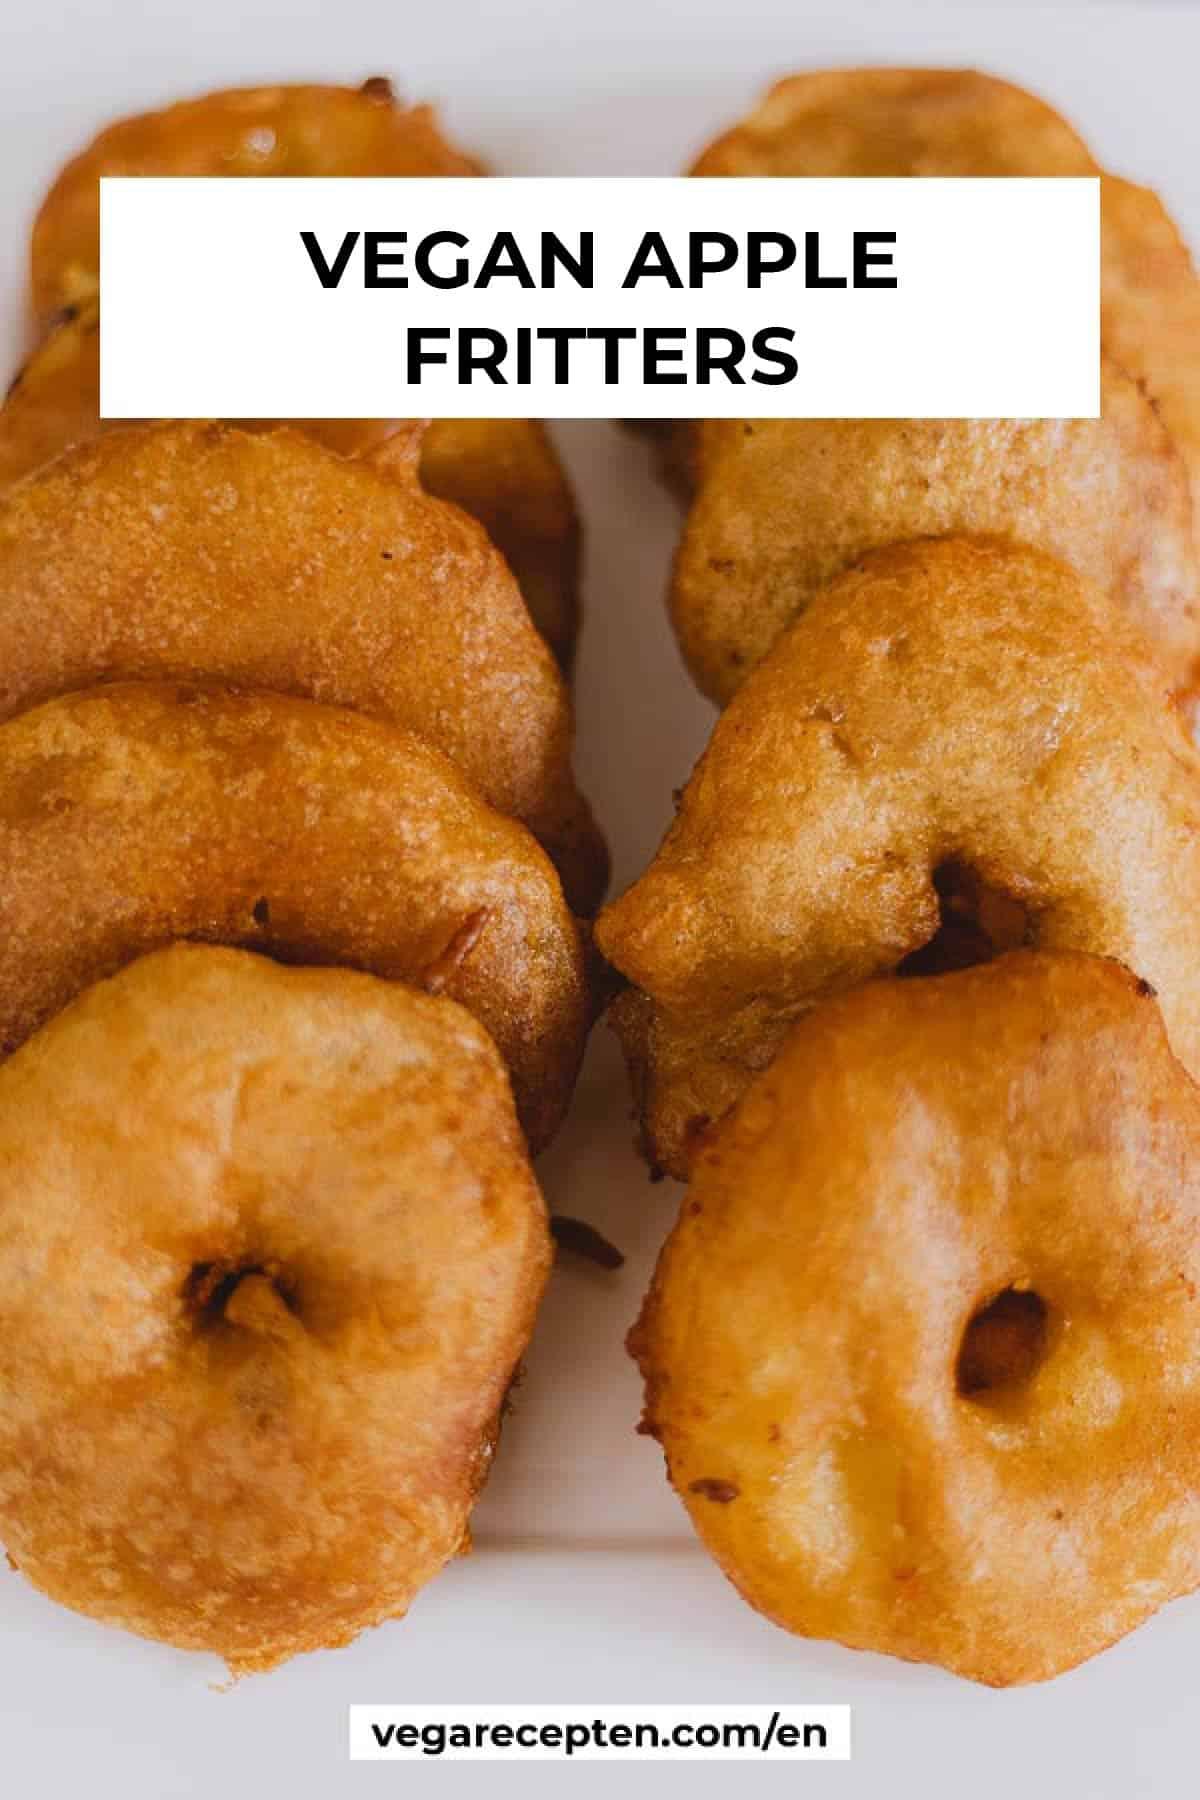 vegan apple fritters fried apple rings recipe